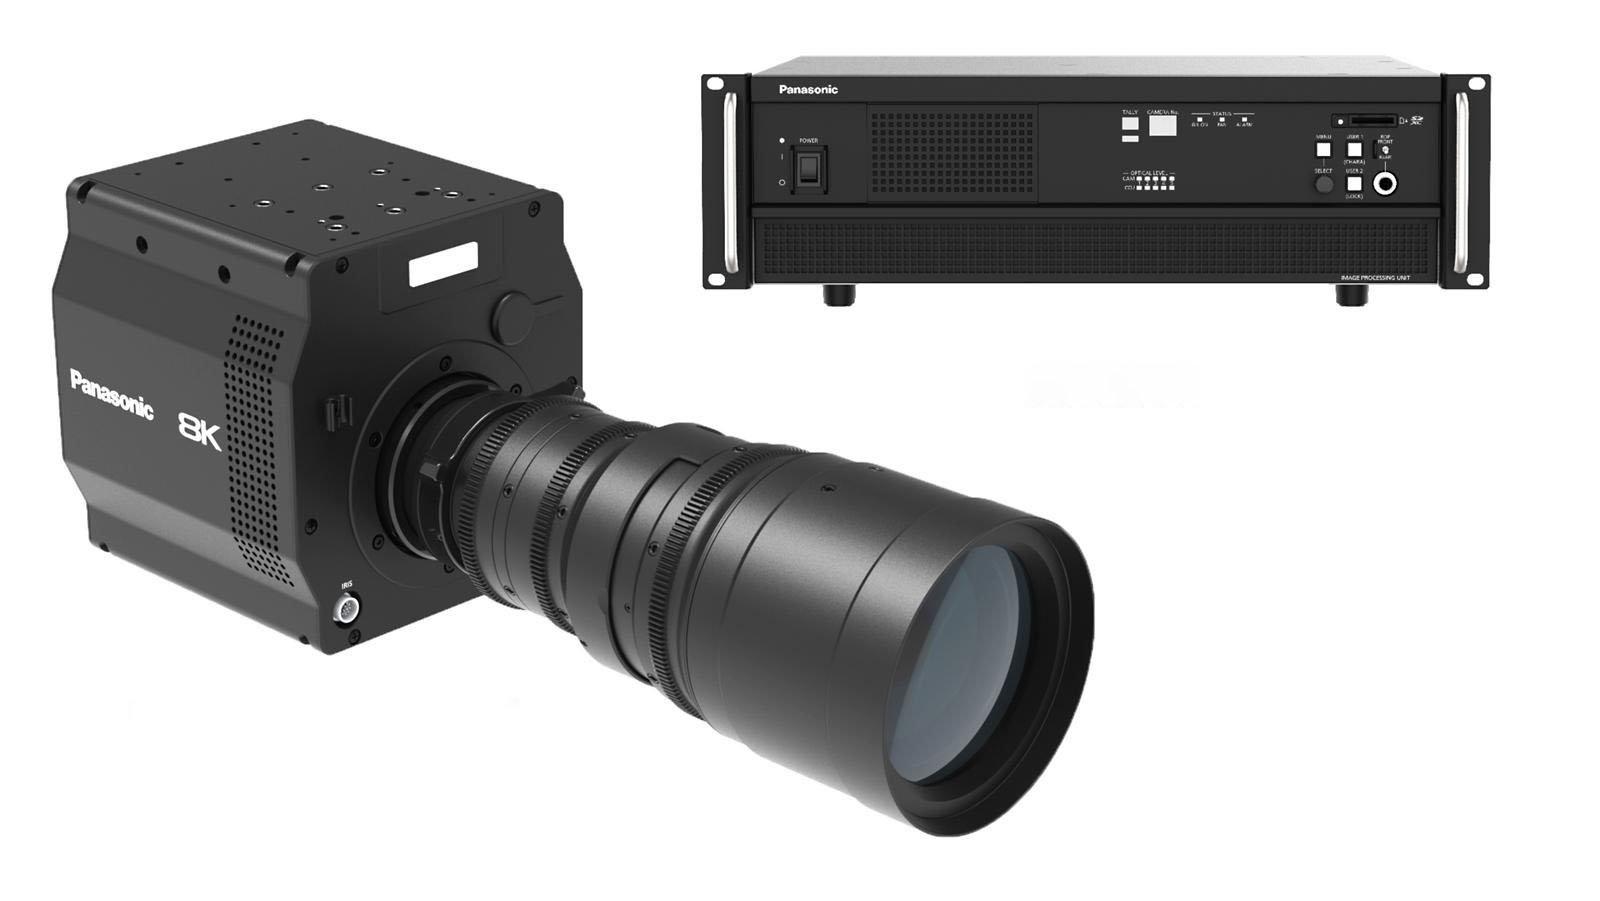 Panasonic 8K camera with organic sensor